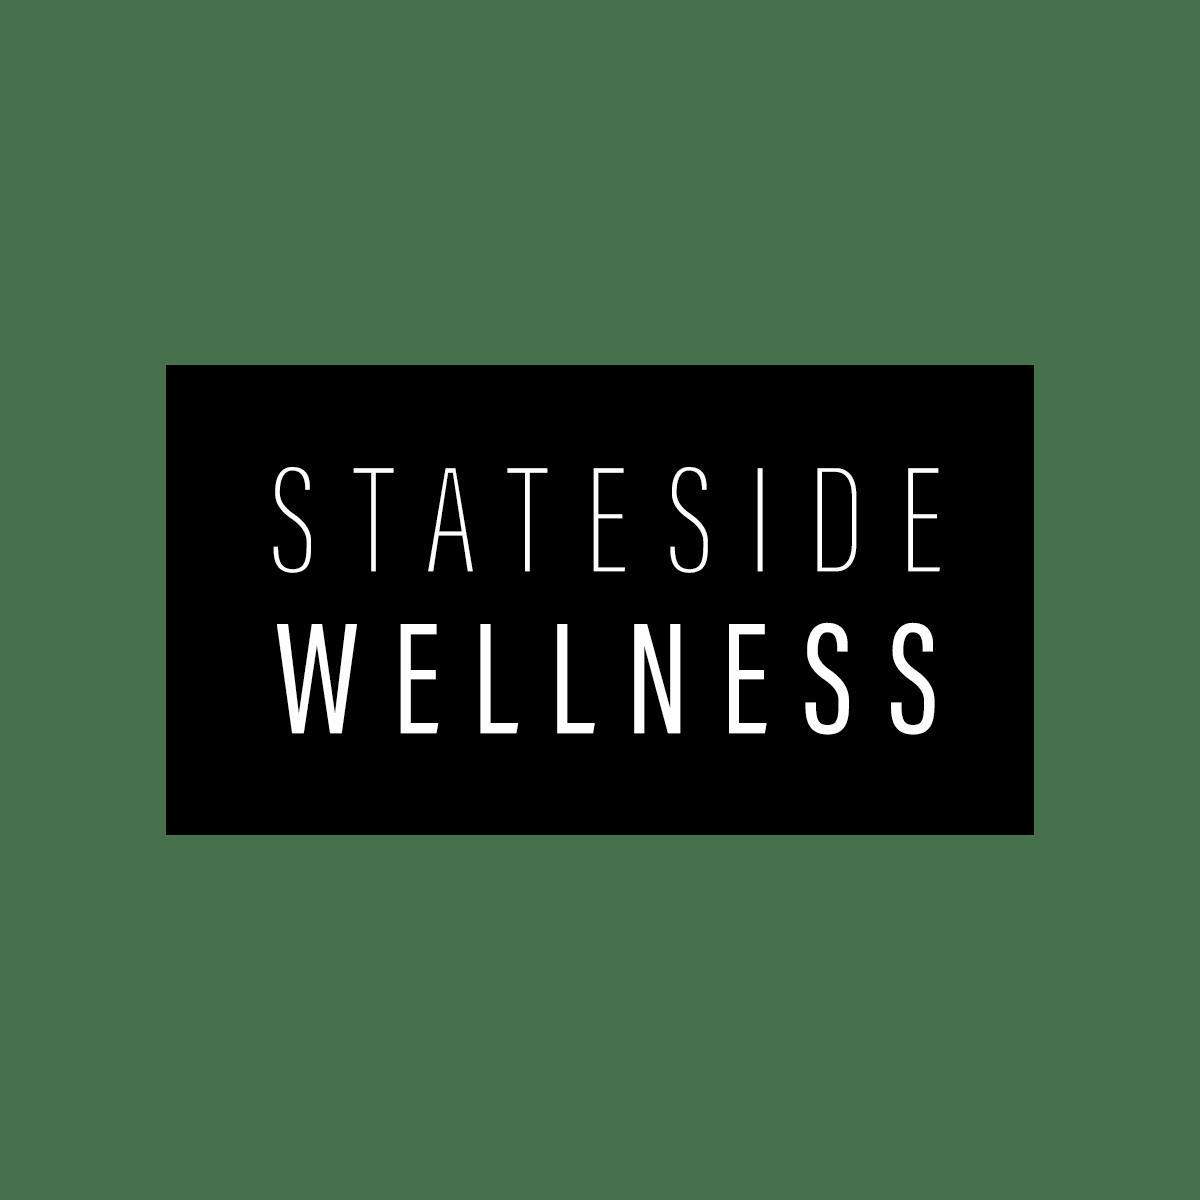 Stateside Wellness | Store